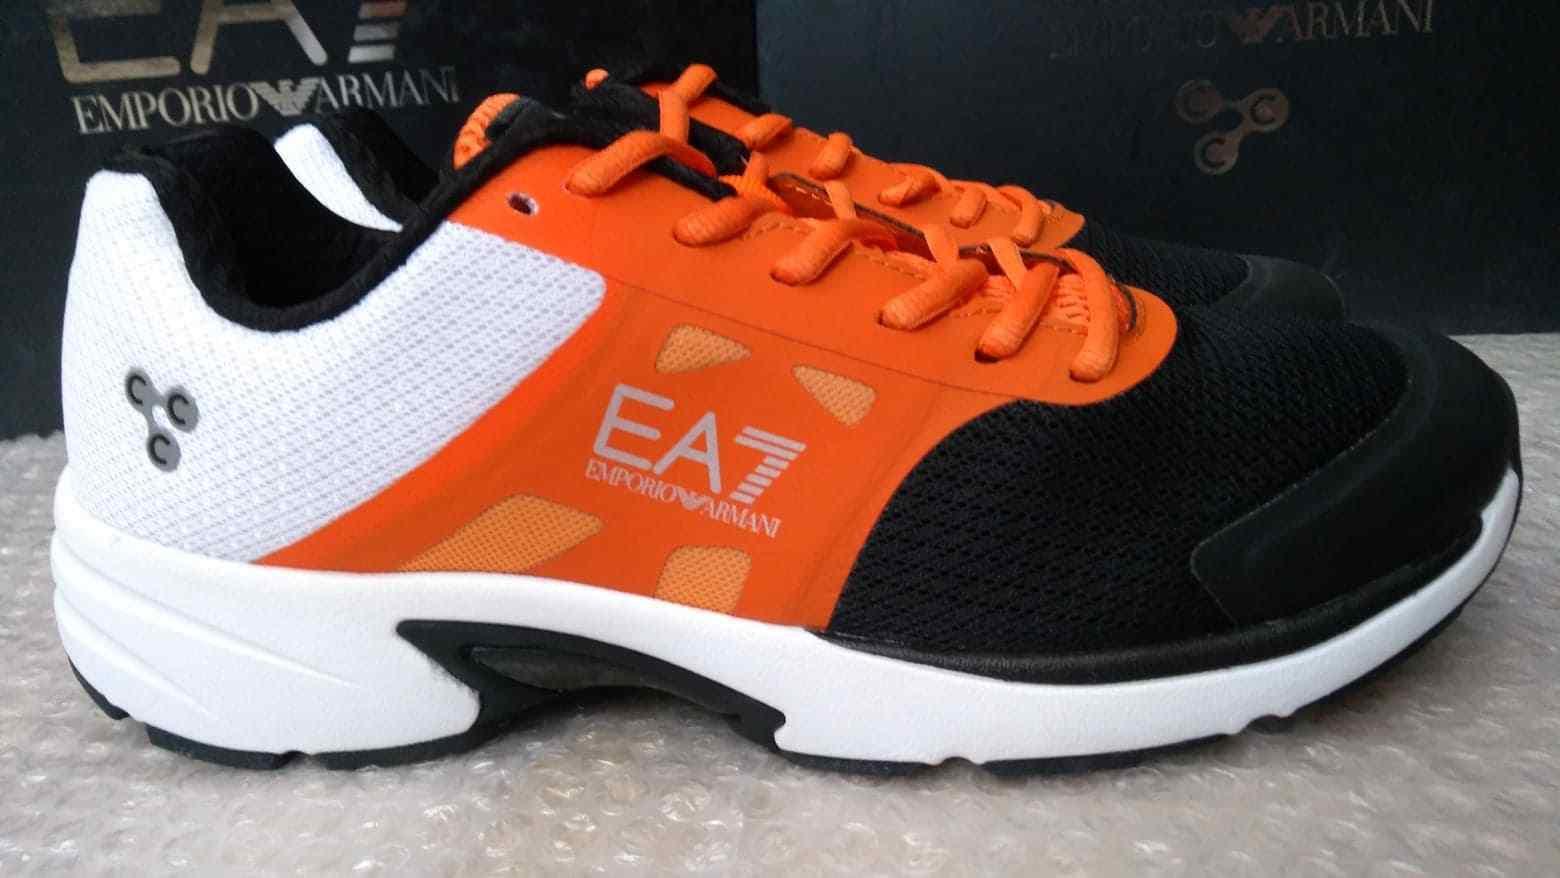 Emporio Armani EA7 C-CUBE U men's trainers size 8.5UK - Carbon Cushion Control